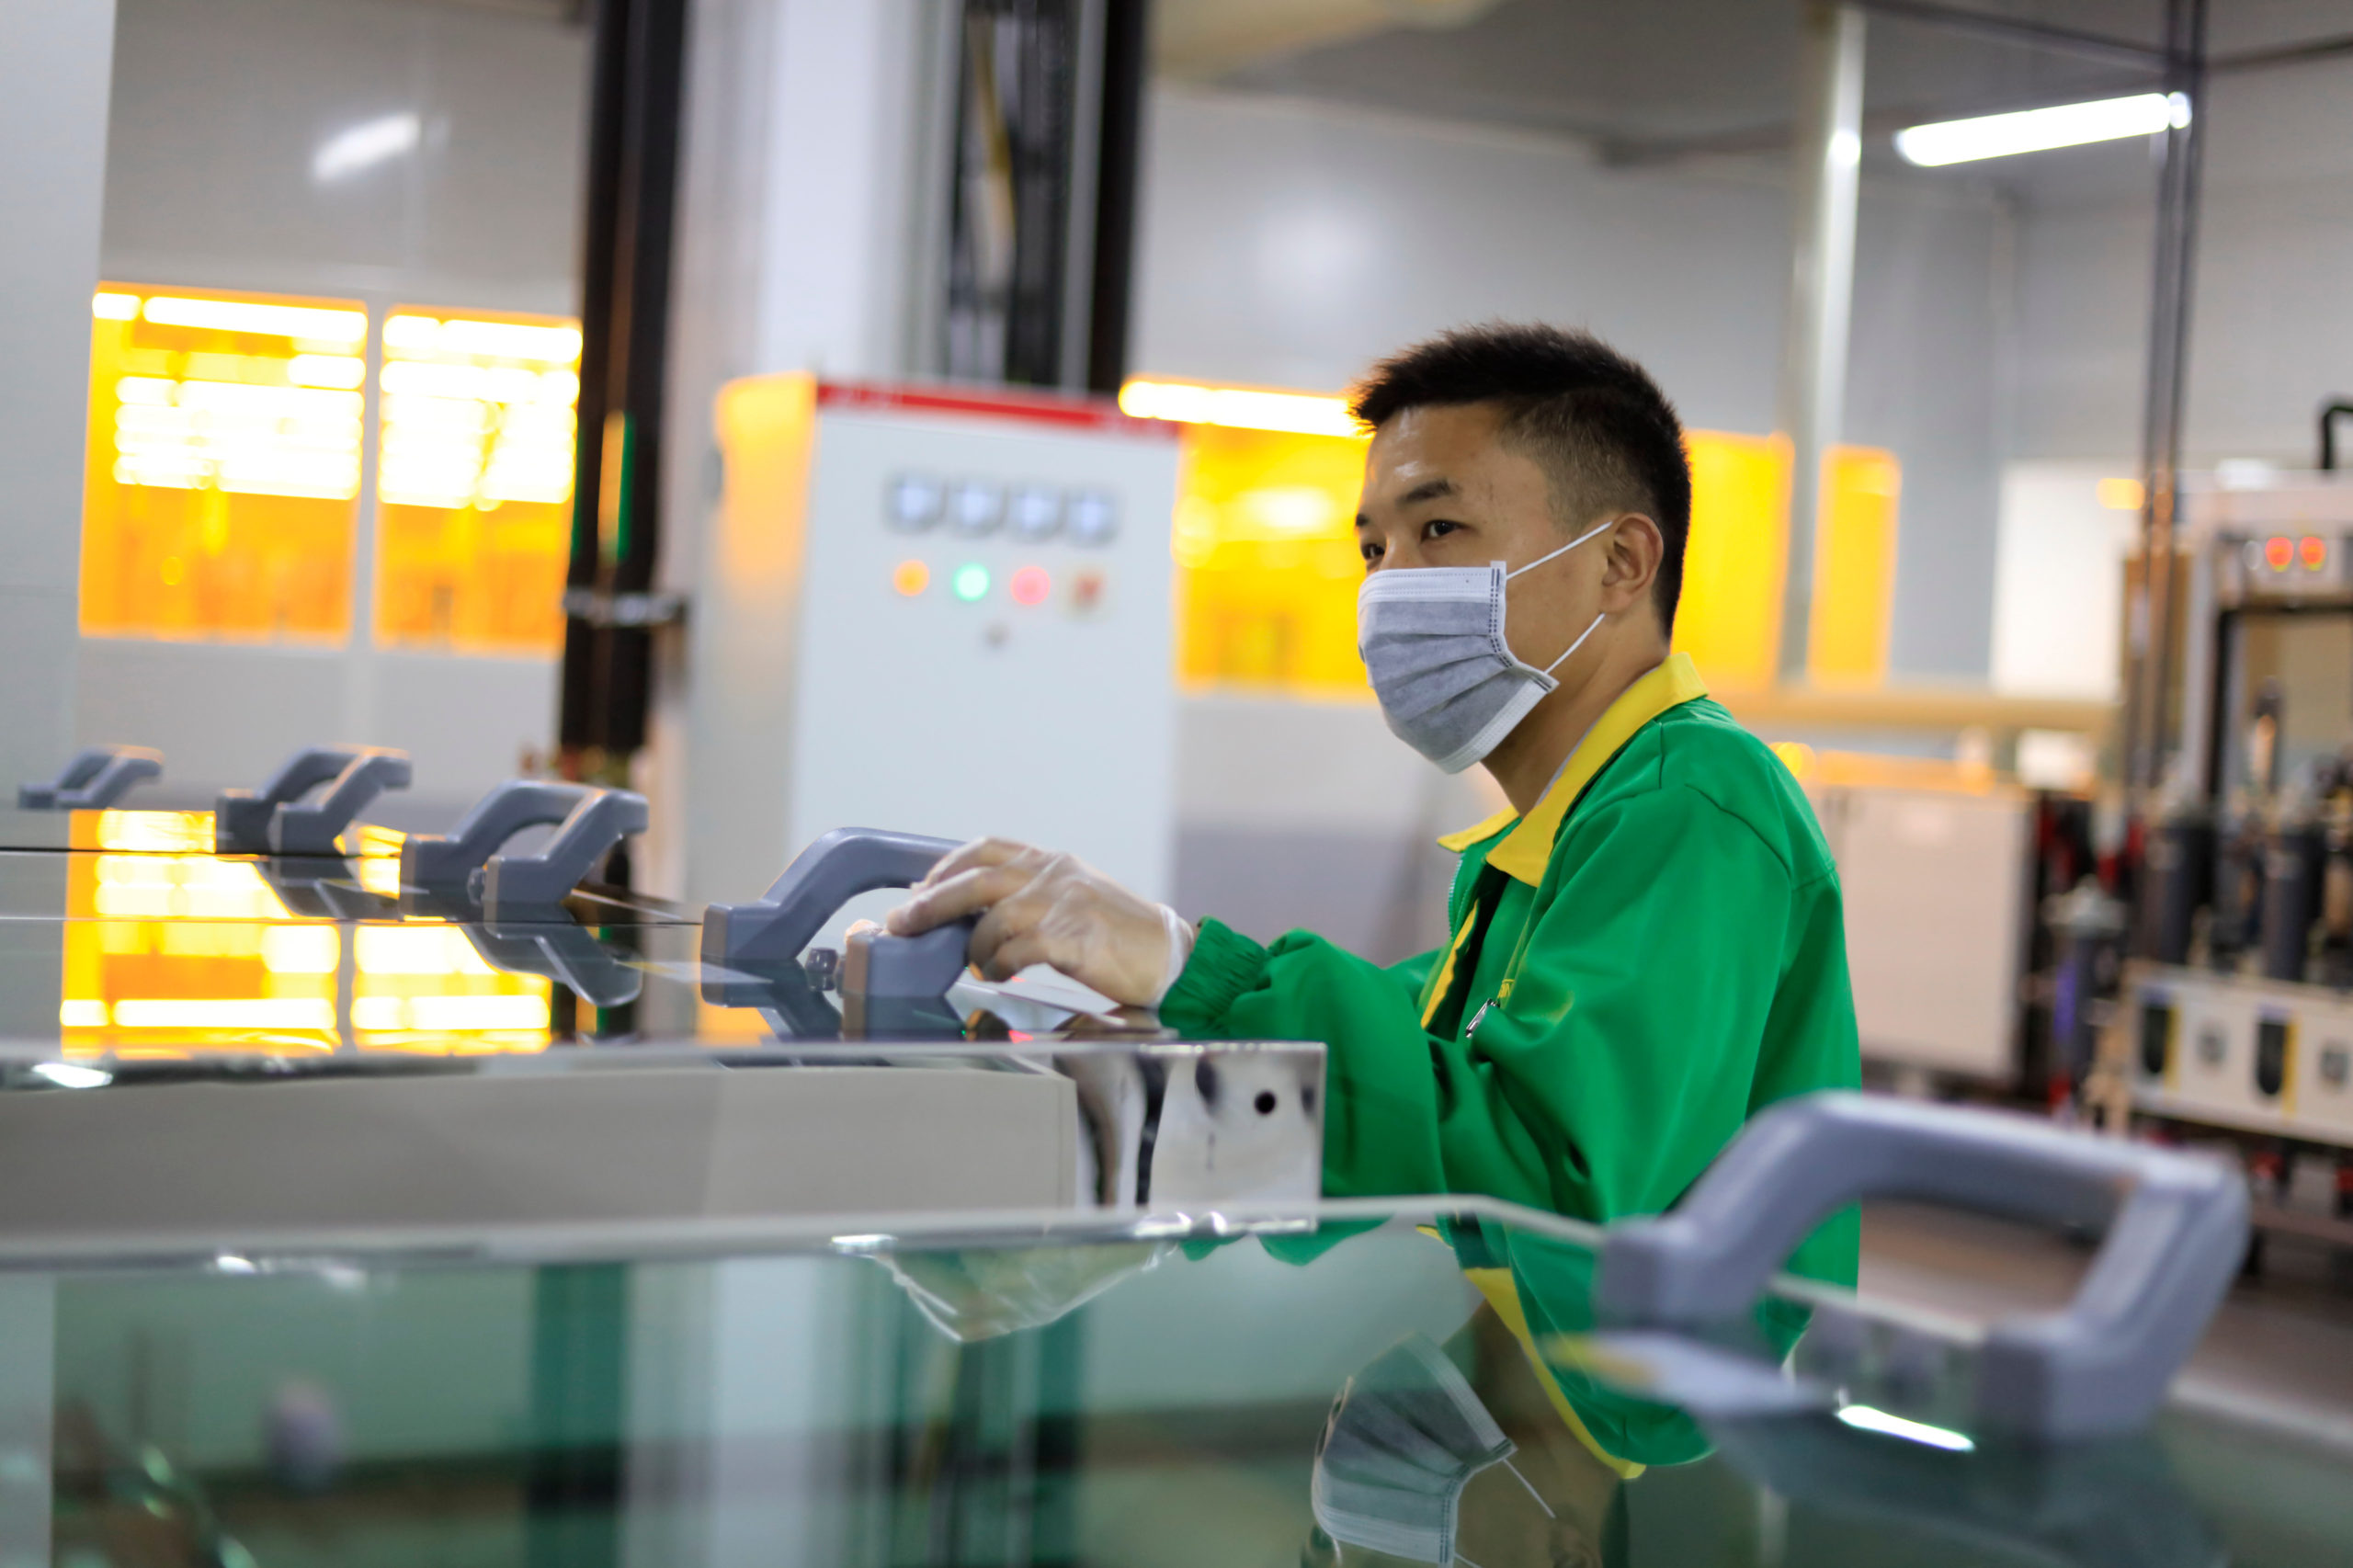 Productie in China komt langzaam weer op gang